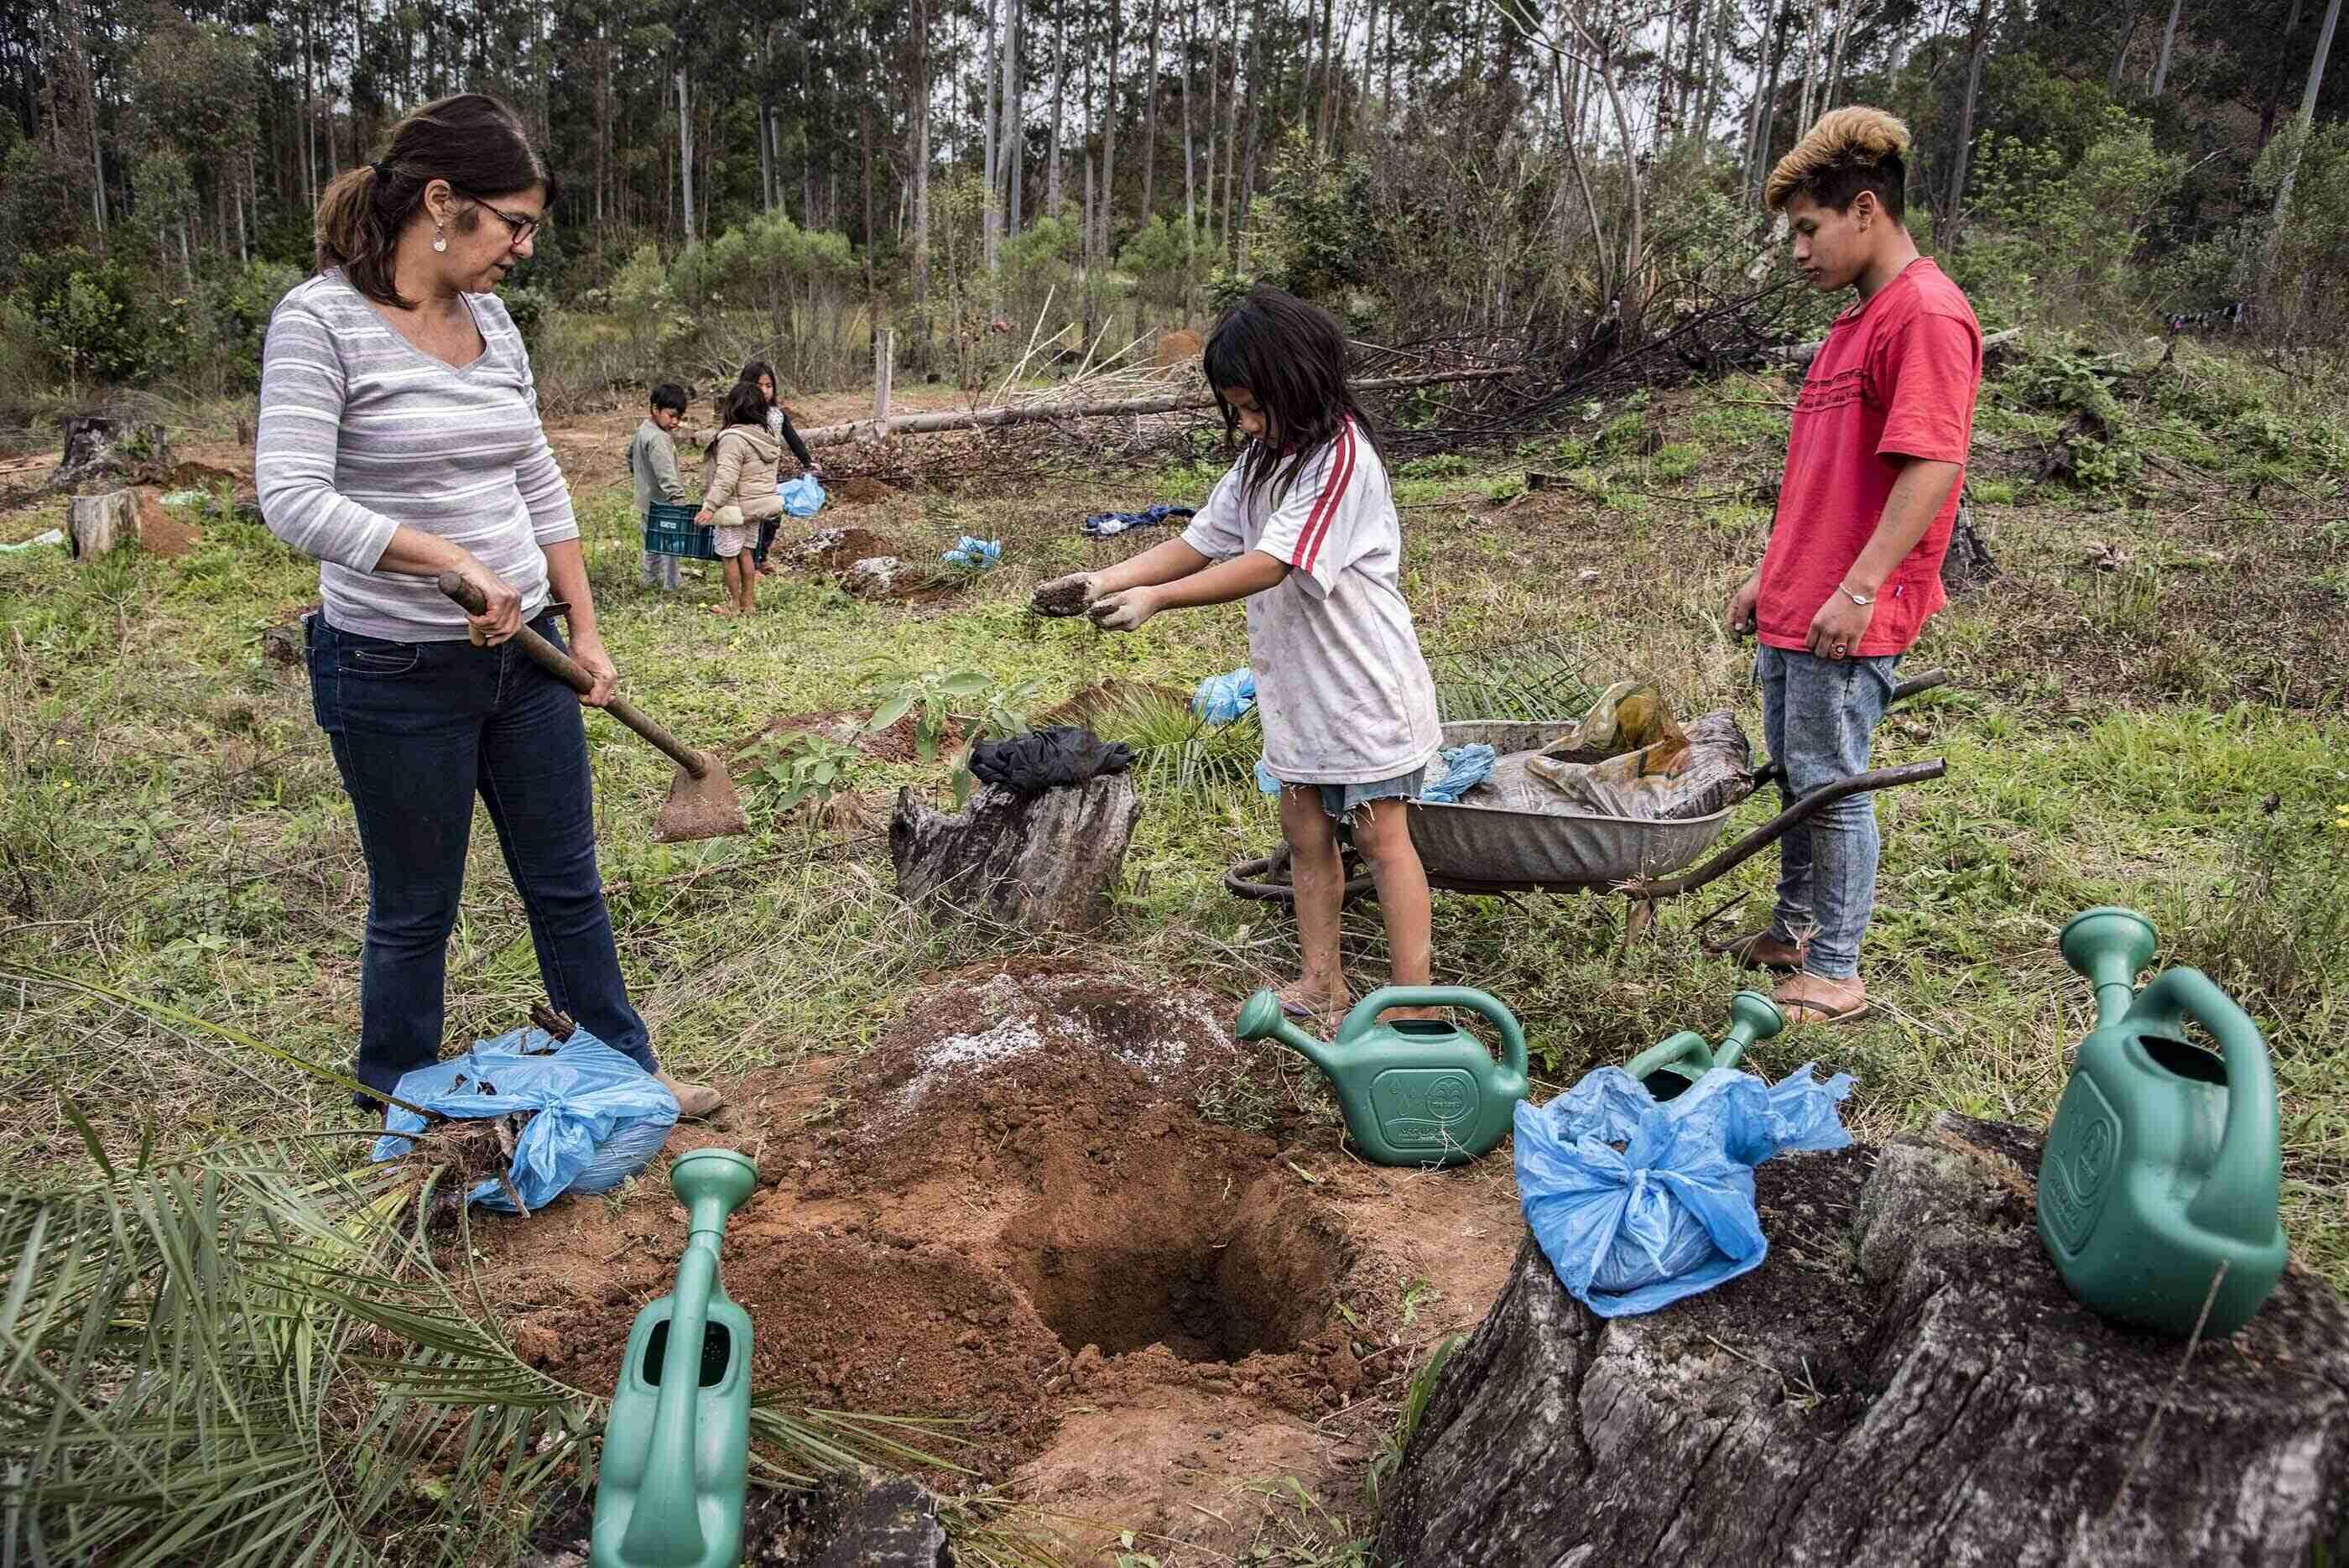 FOTOS FERNANDO DIAS/SEAPDR guarani-butiá 2-02P